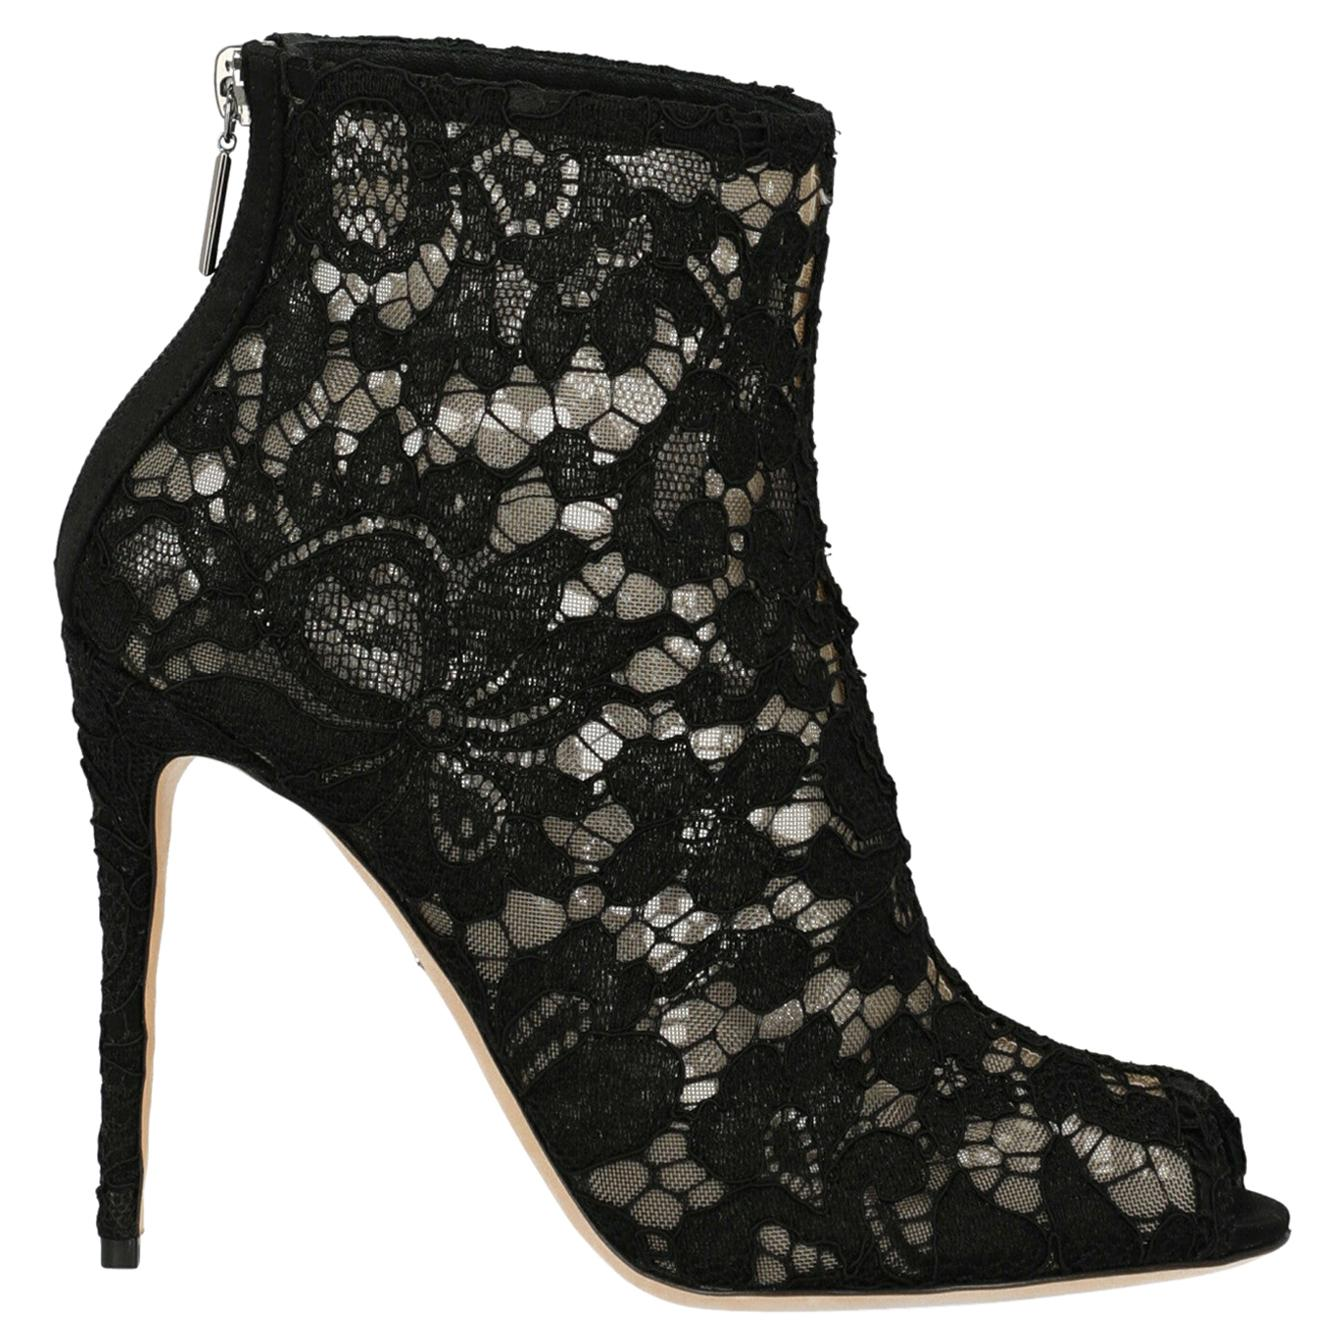 Dolce & Gabbana Woman Ankle boots Beige, Black IT 37